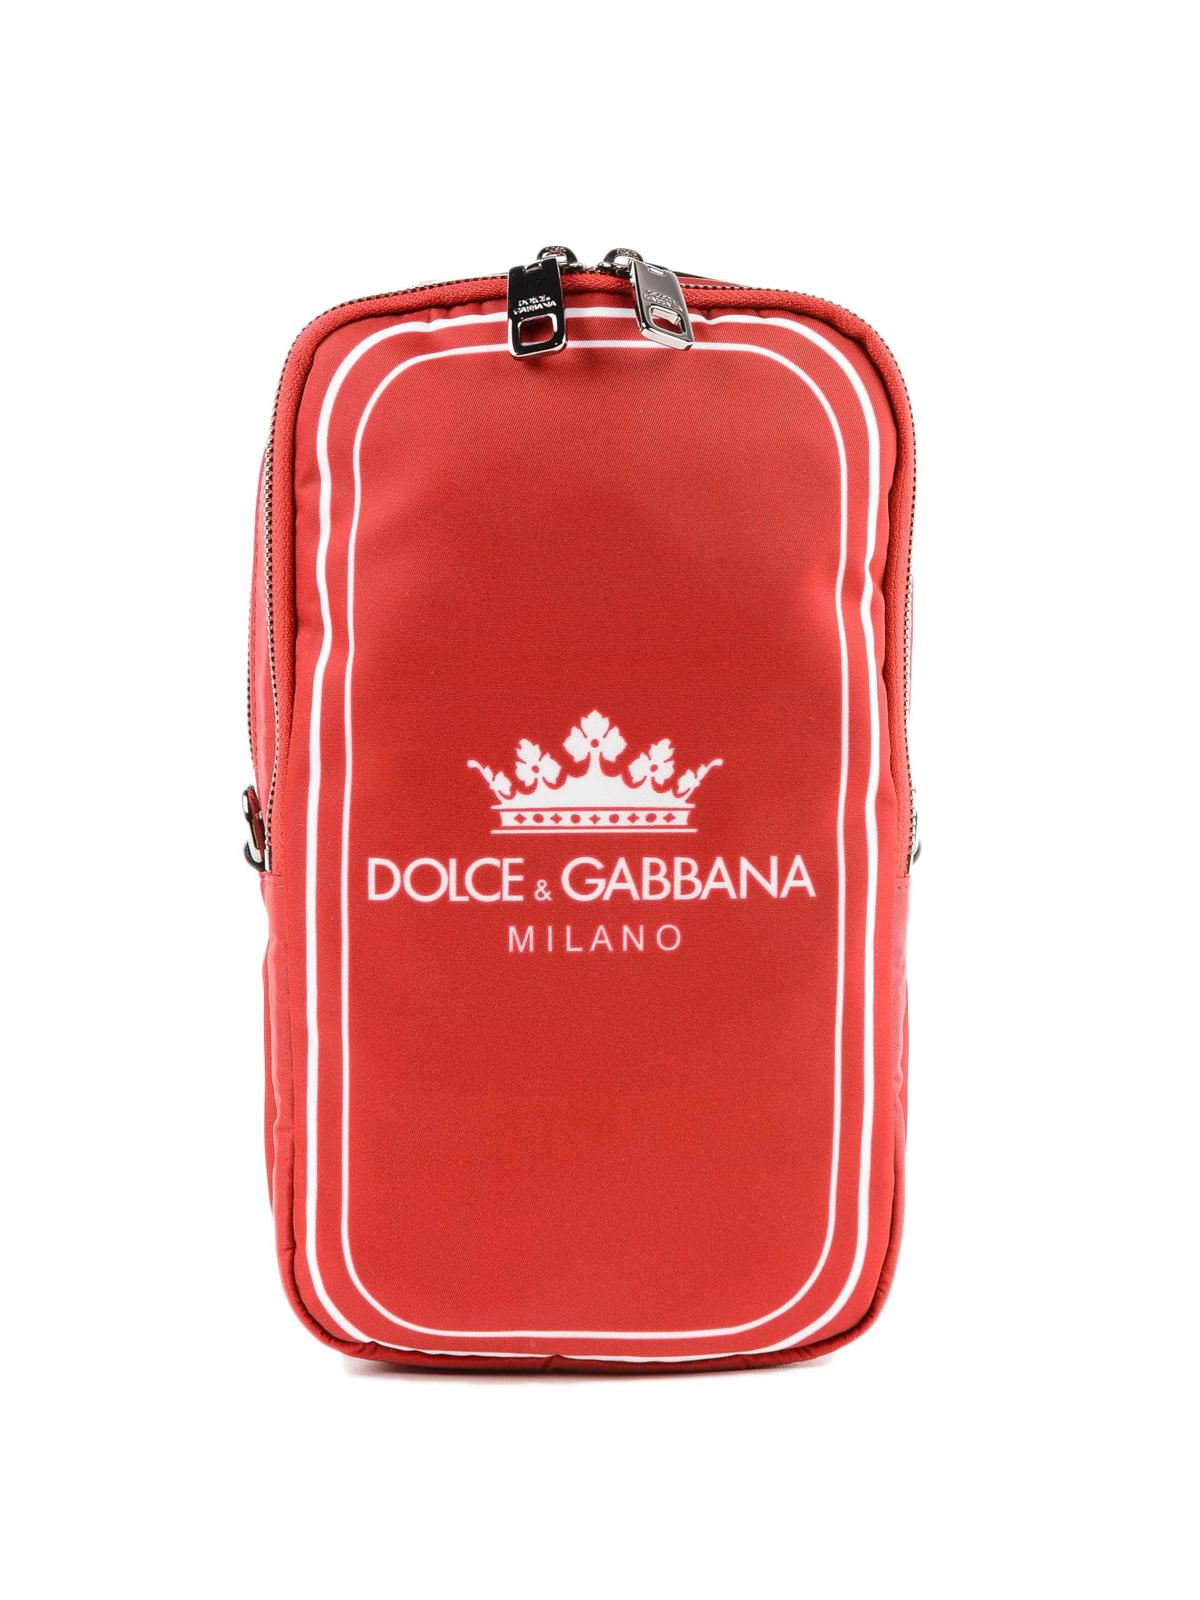 9fe67effc0 Dolce   Gabbana - Mediterraneo logo print red nylon bag - cross body ...